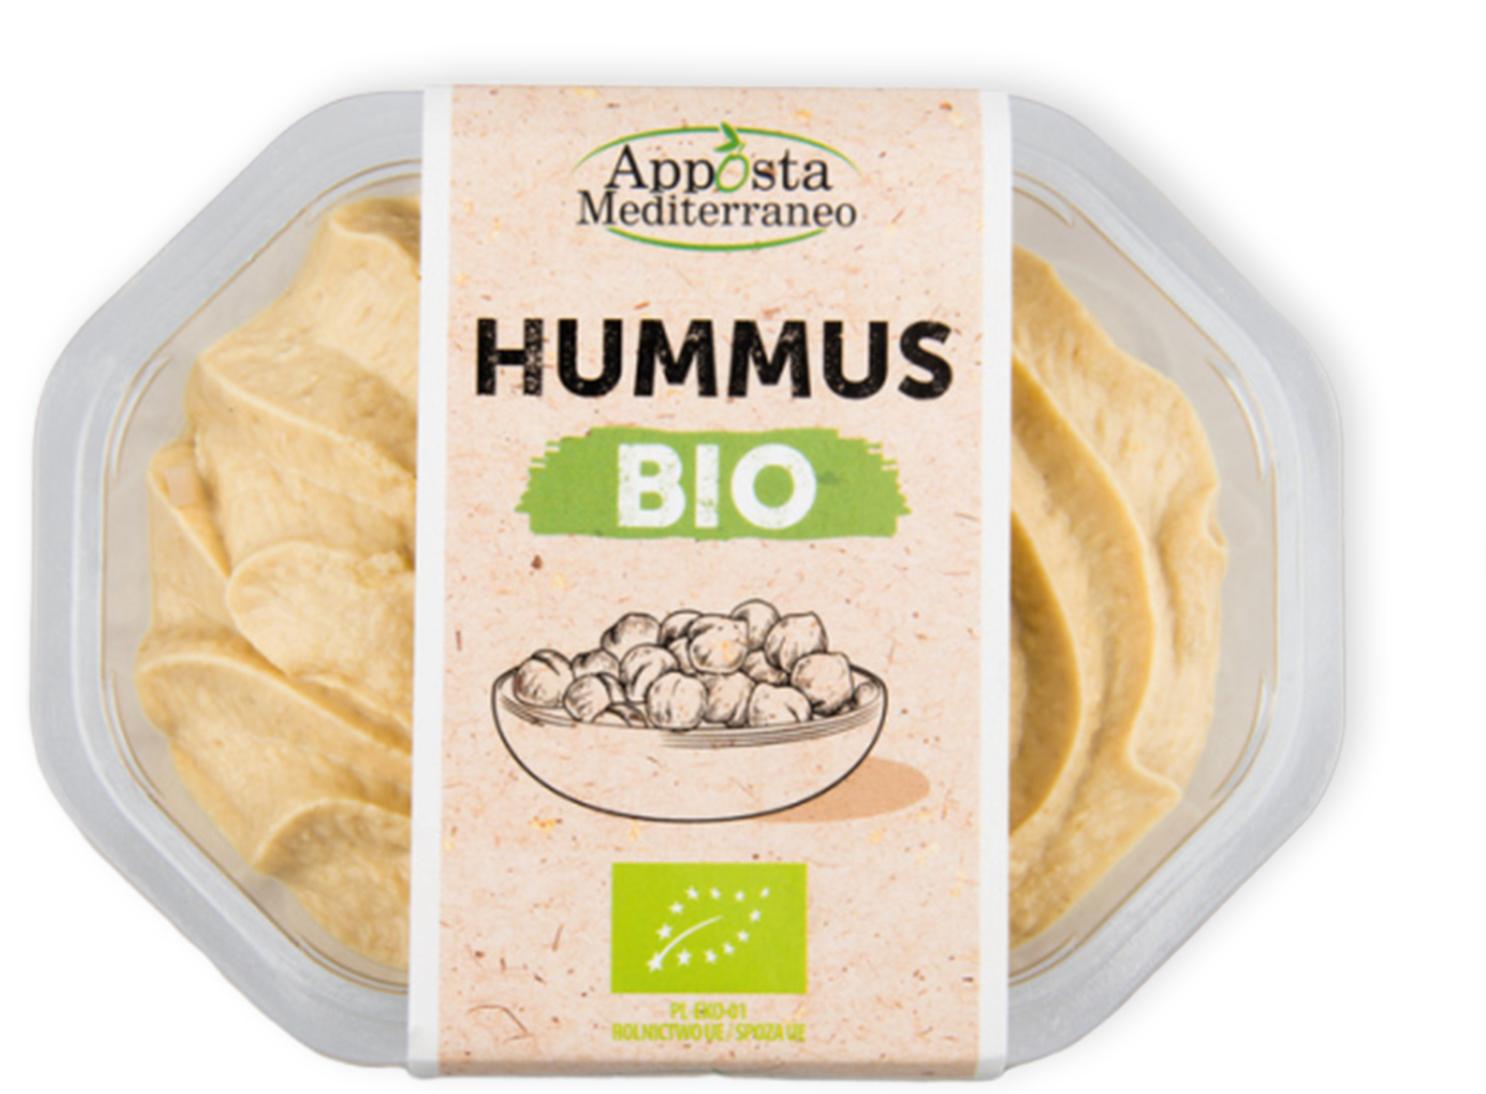 Hummus BIO Apposta Mediterraneo Lidl